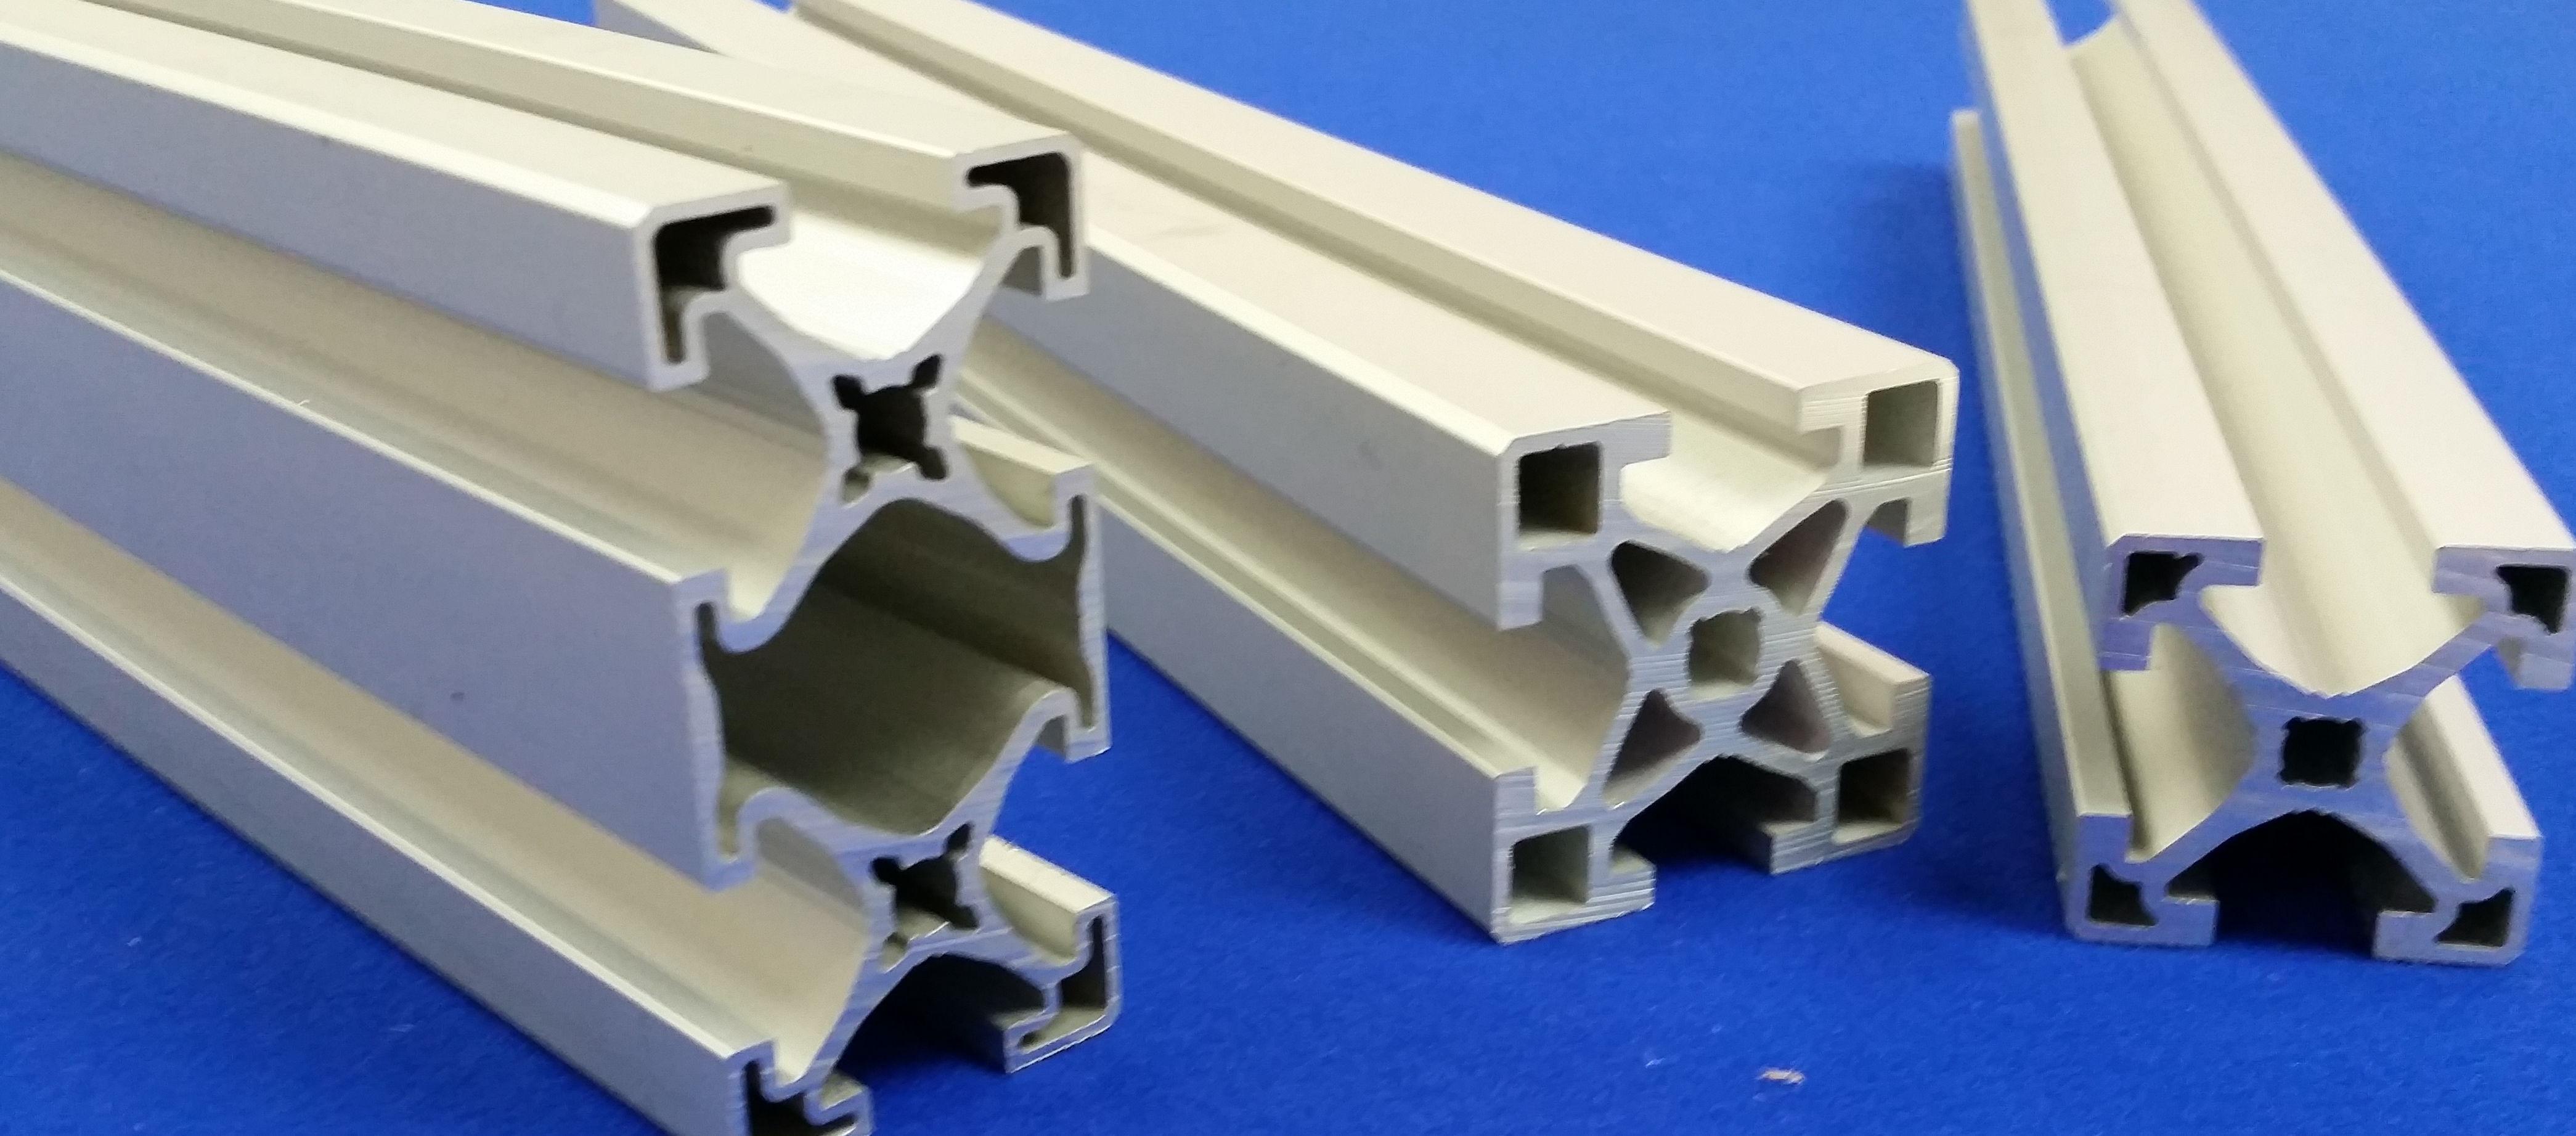 Aluminum extrusion frame samples